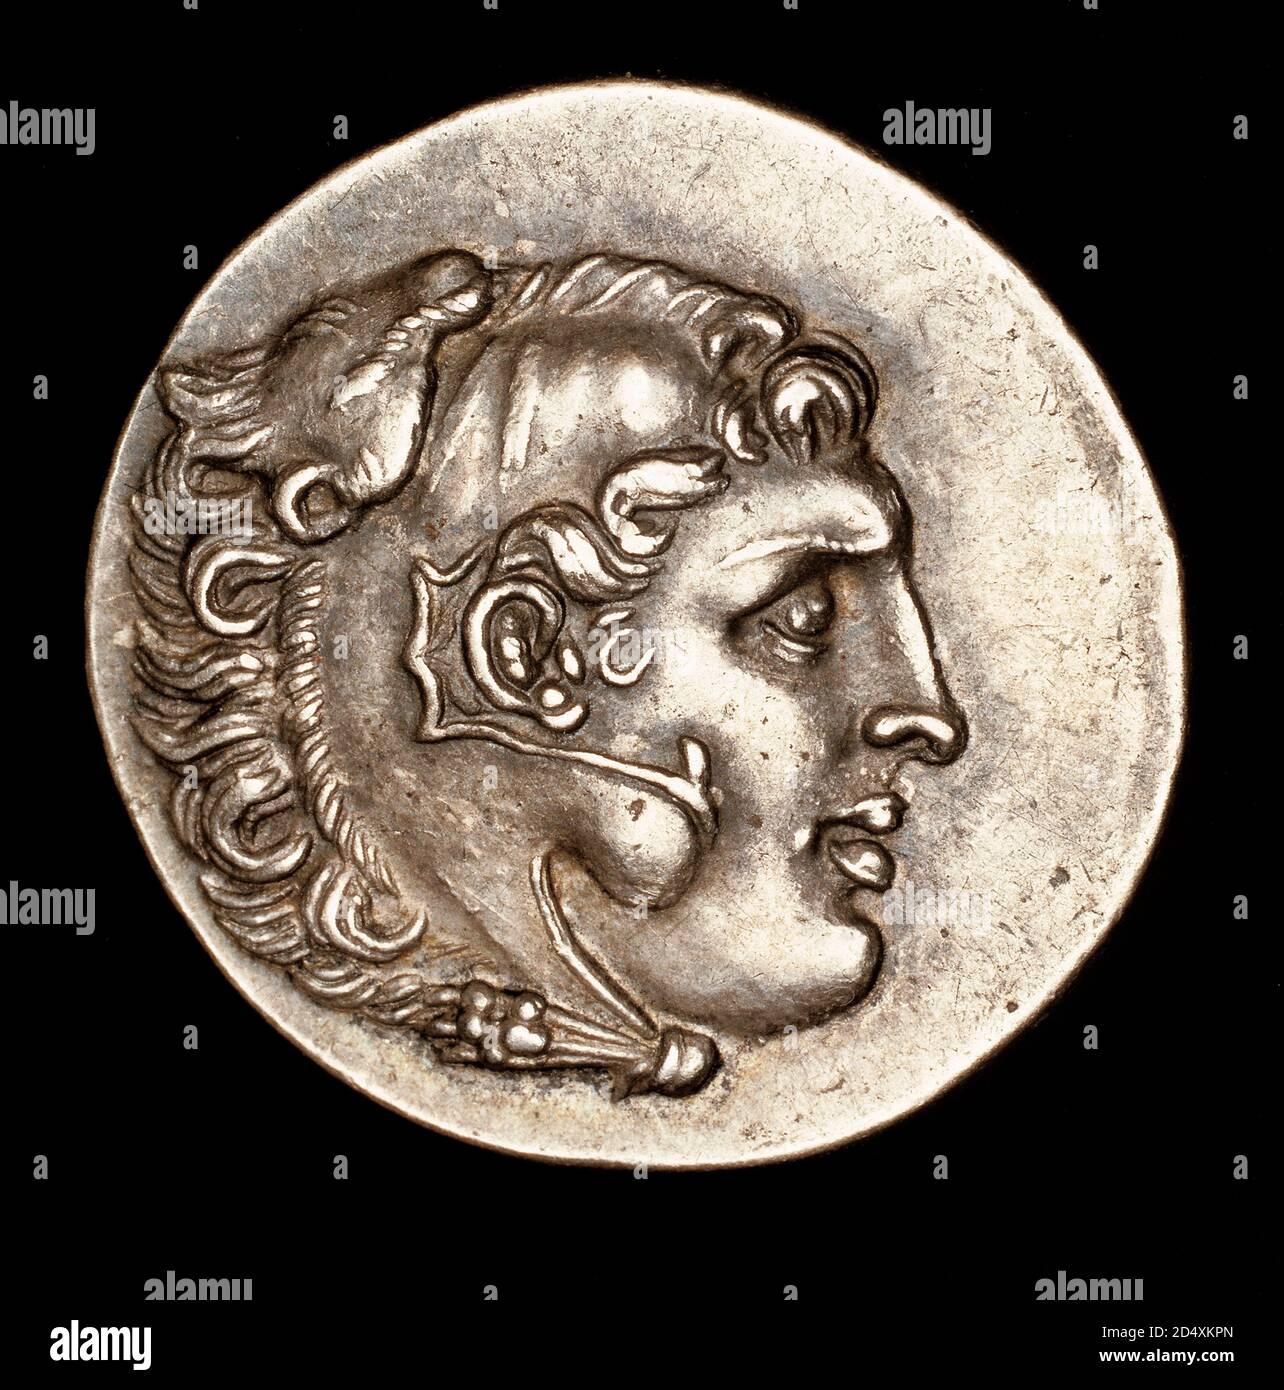 Rara moneda griega antigua, plata Tetradrachm, Clozomenae (asunto póstumo) Alejandro Magno con el Casco de León Nemeo, 200 AC Foto de stock